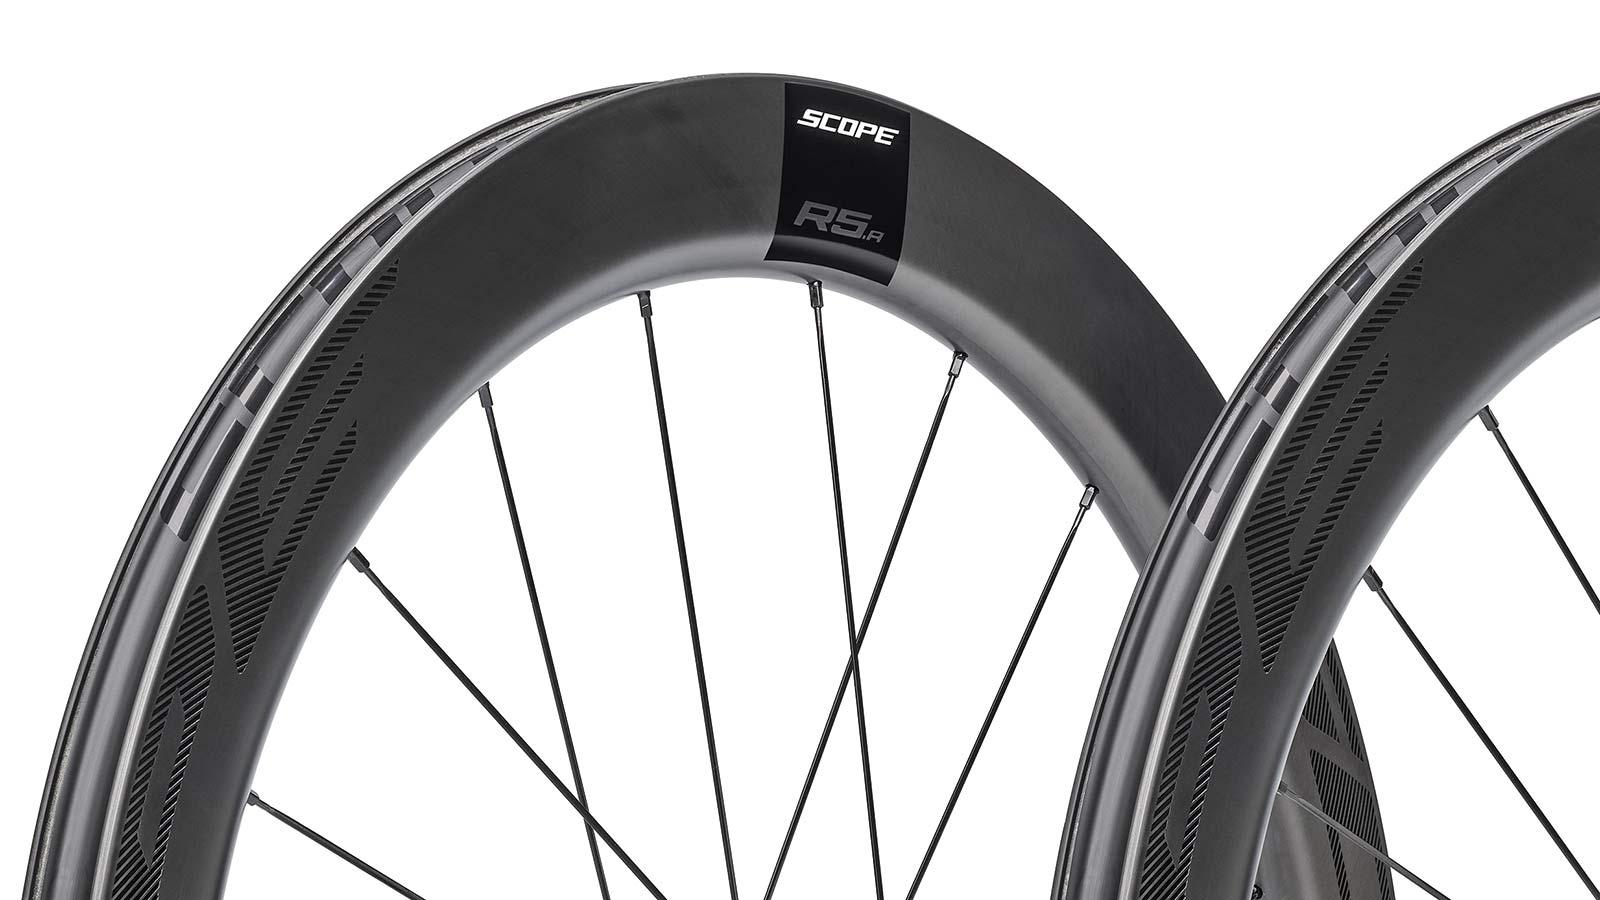 Scope All-Road aero carbon gravel bike wheels, lightweight aerodynamic tubeless rim details